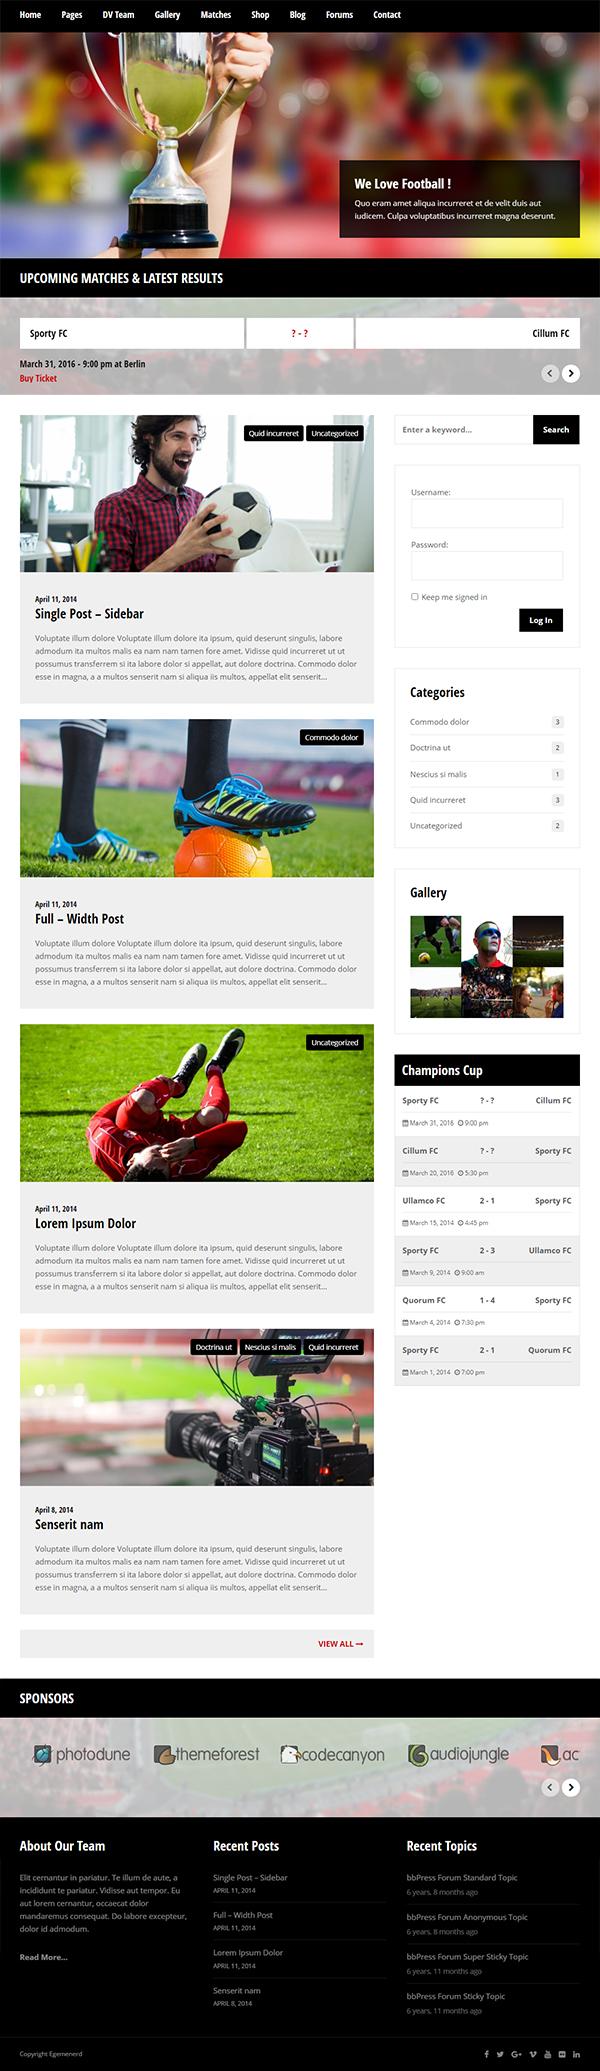 Sporty Responsive WordPress Theme for Sport Clubs